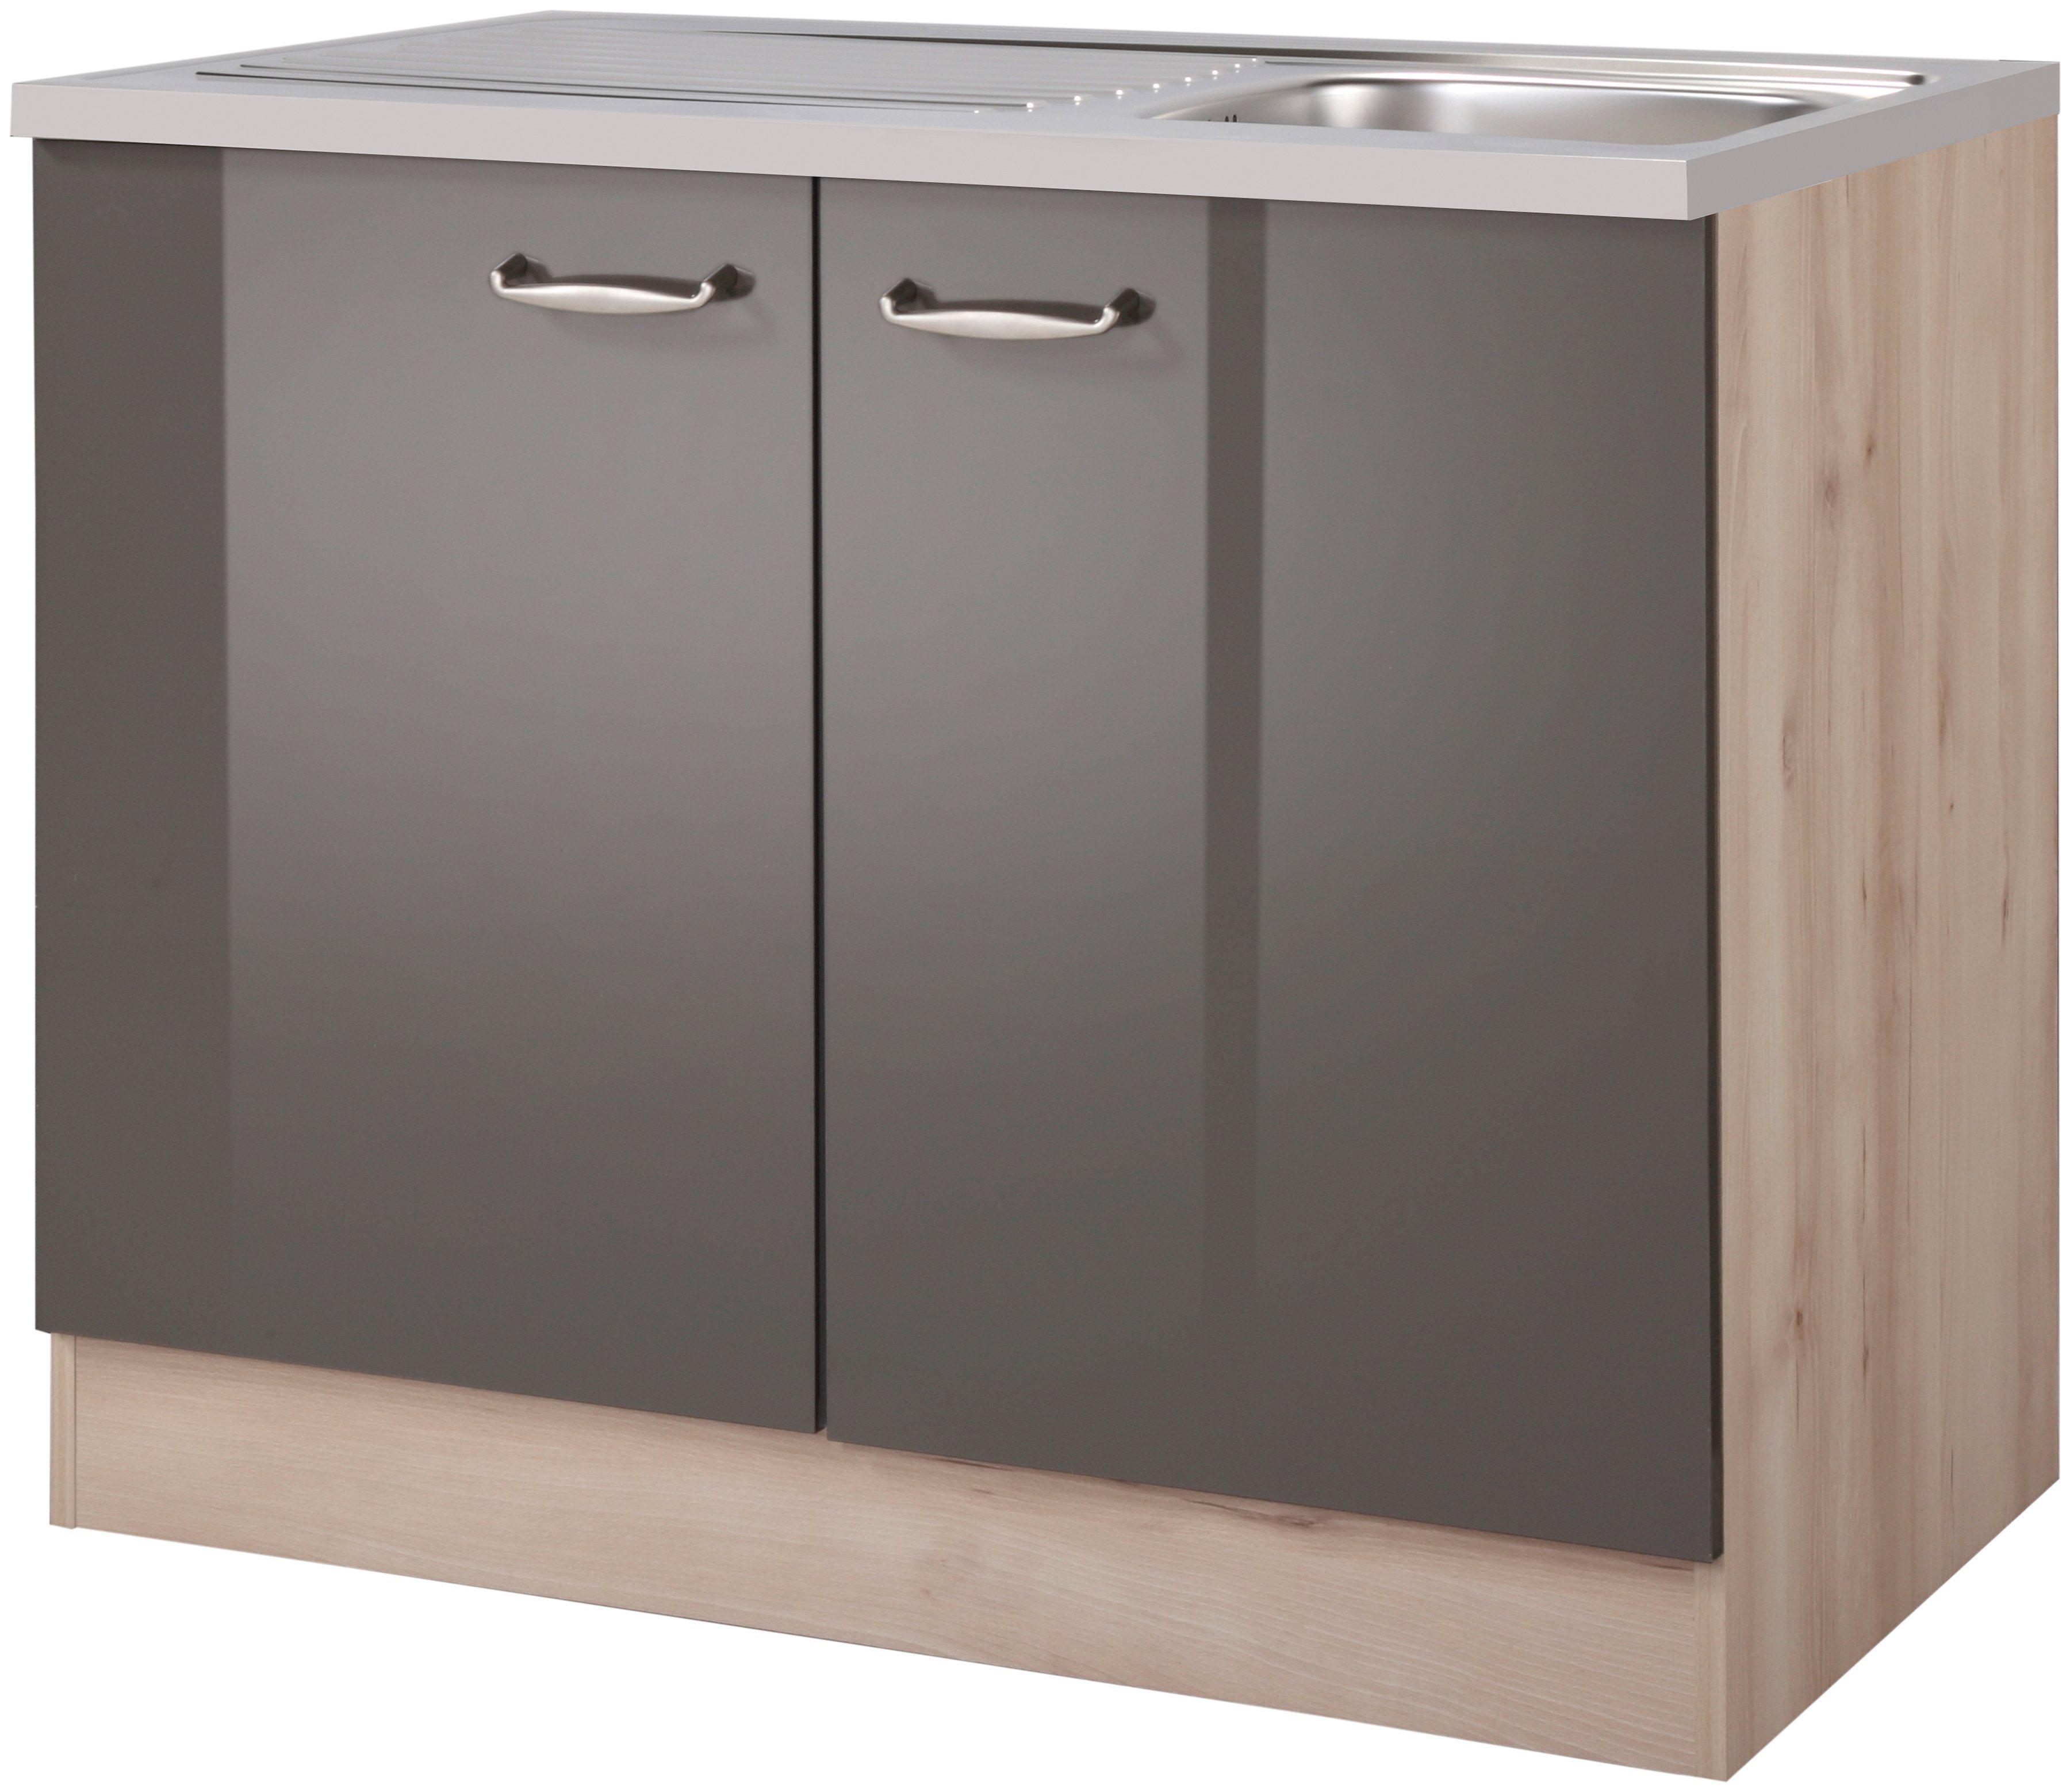 OPTIFIT Spülenschrank »Calgary, Breite 100 cm« | Küche und Esszimmer > Küchenschränke > Spülenschränke | Holzwerkstoff | OPTIFIT